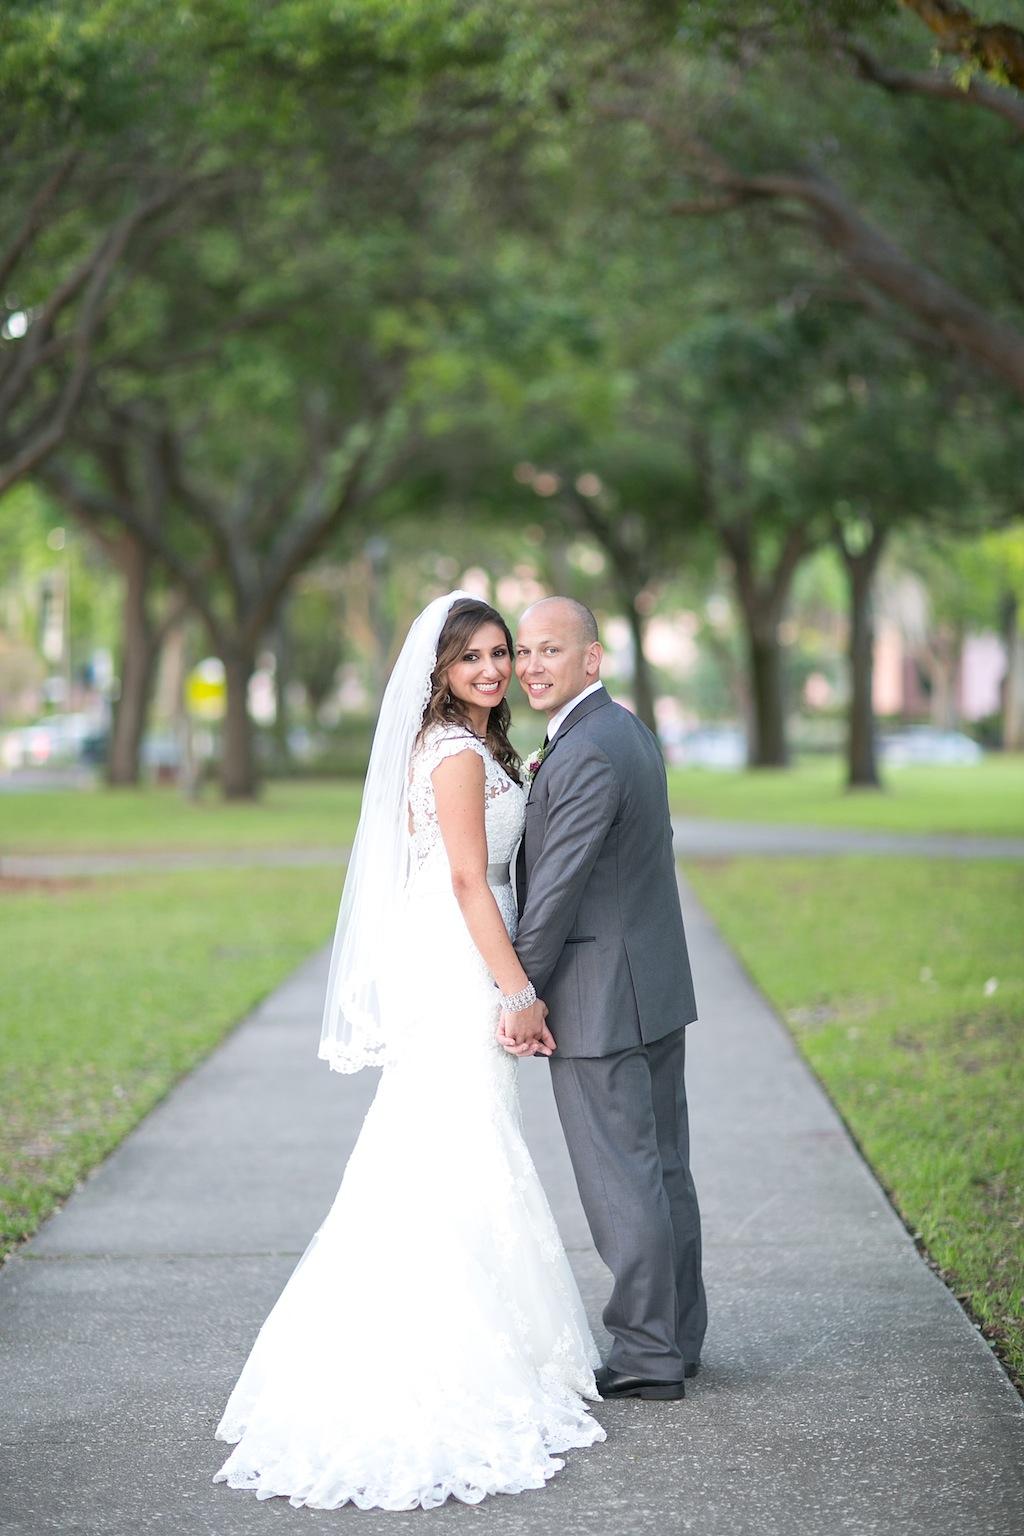 Downtown St. Pete Wedding - Birchwood Wedding - North Straub Park Wedding - Jenn Hopkins Photography (43)